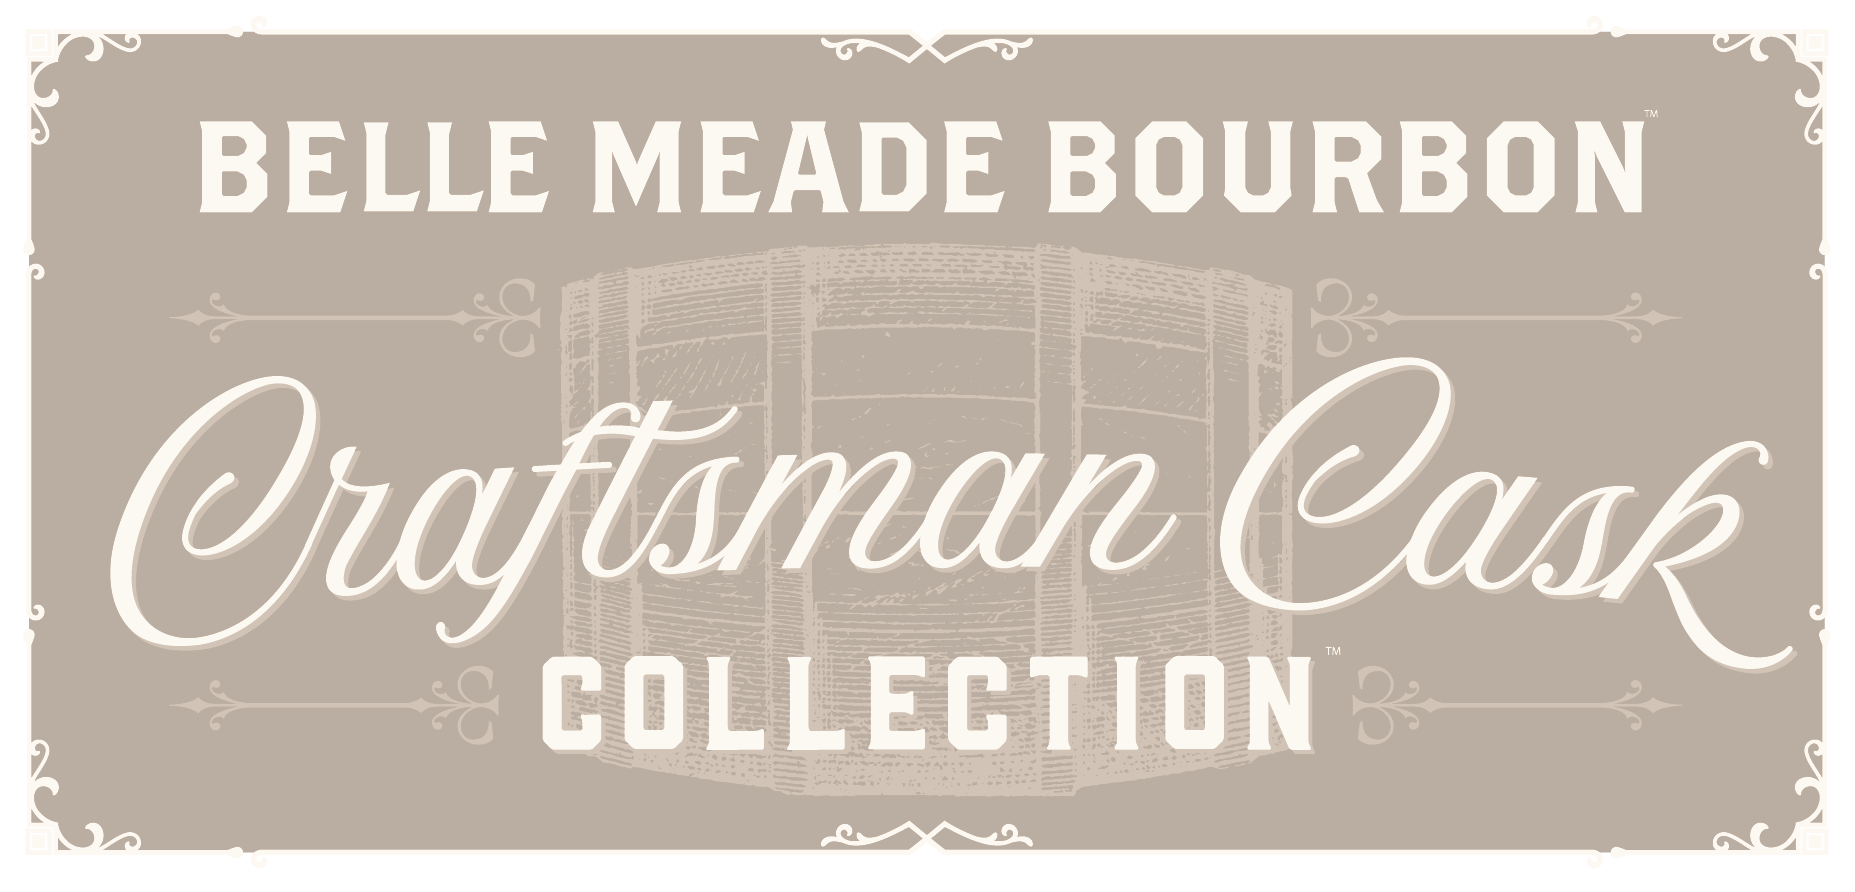 Belle Meade Bourbon | Craftsman Cask Collection